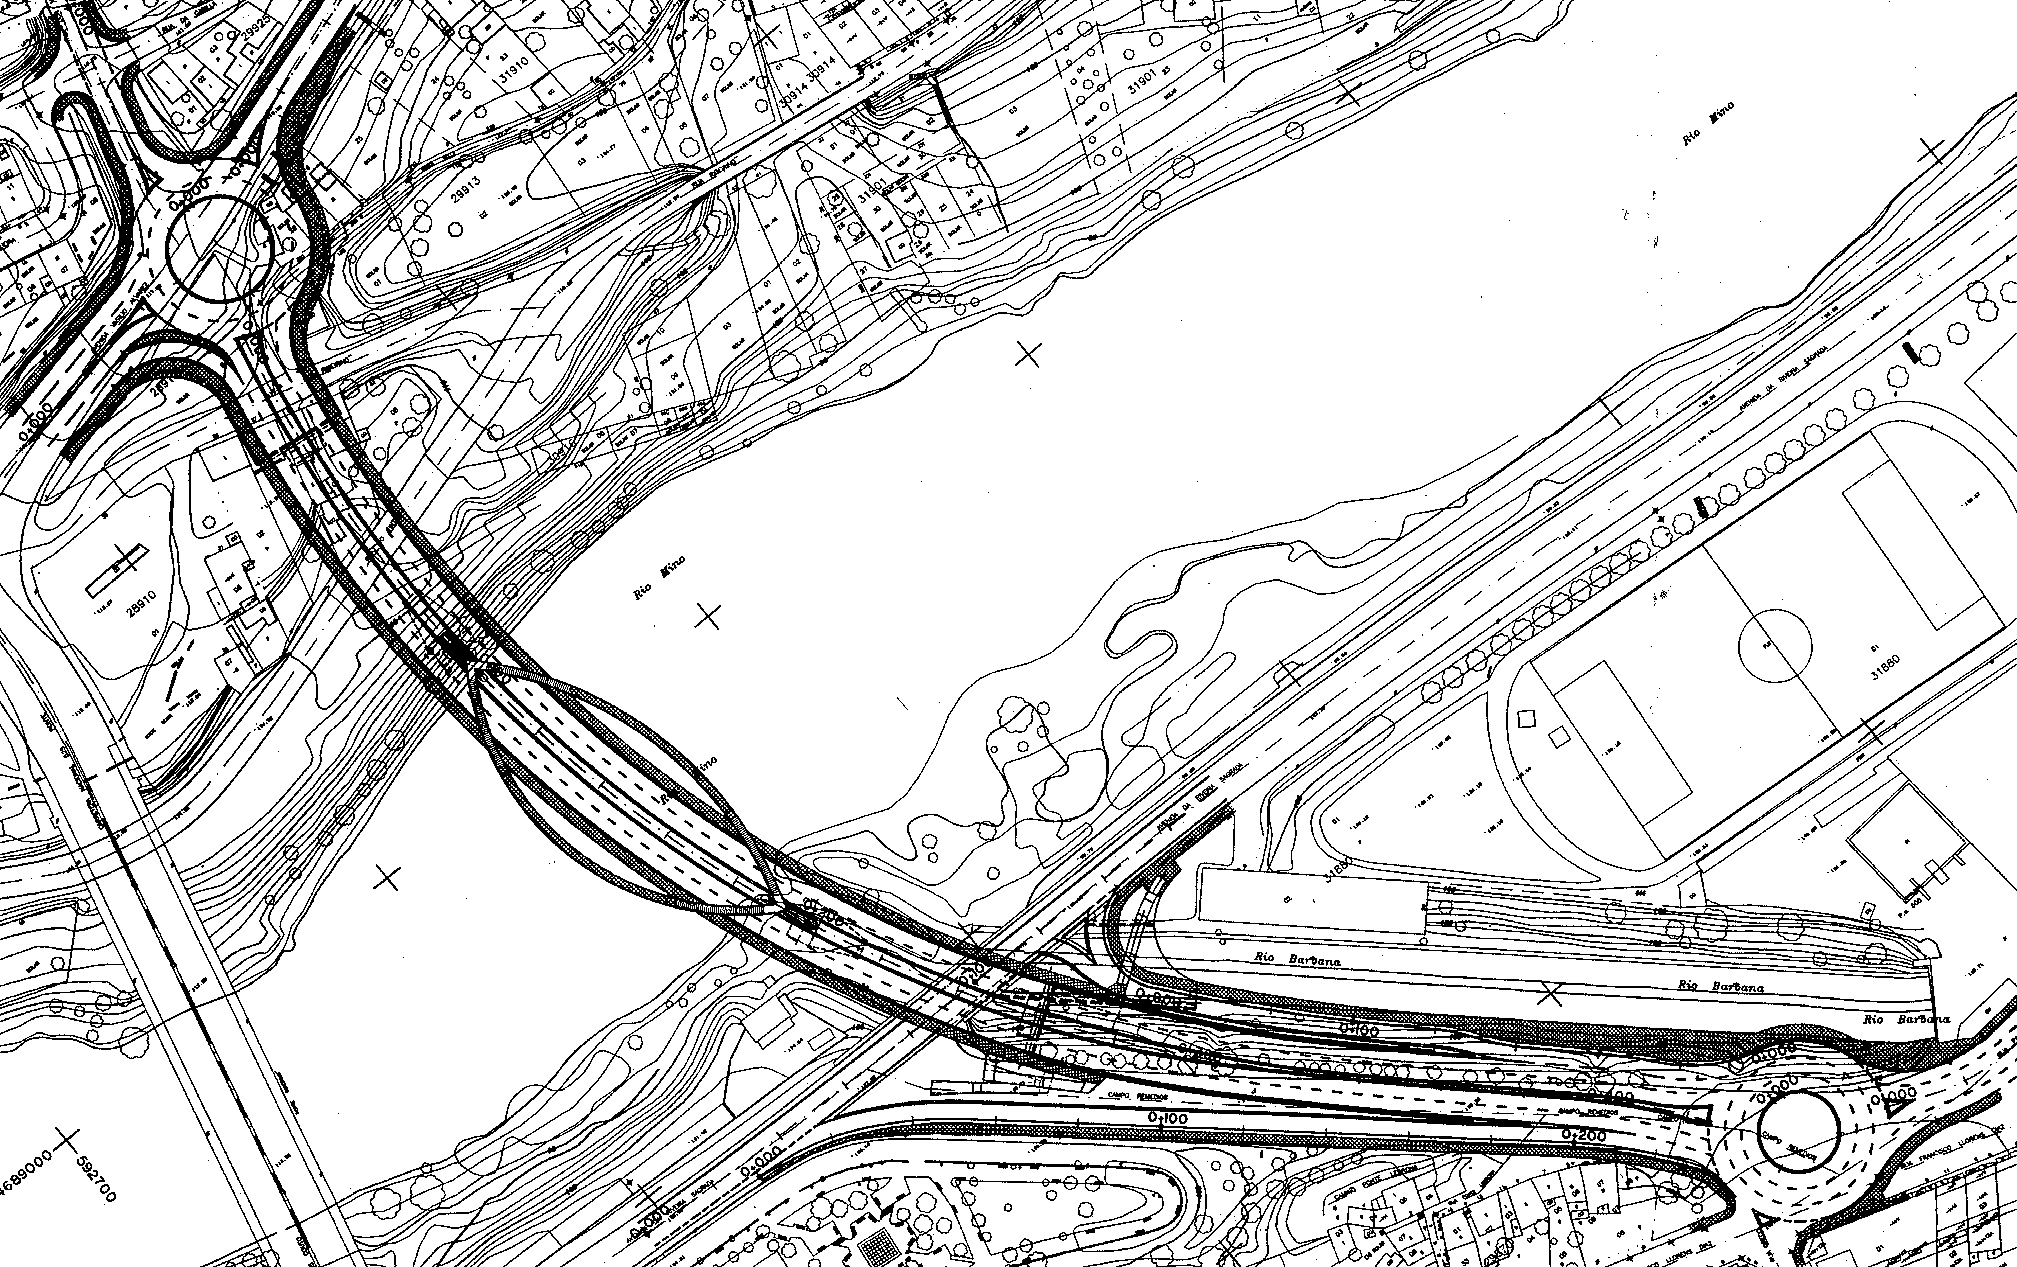 image112.png